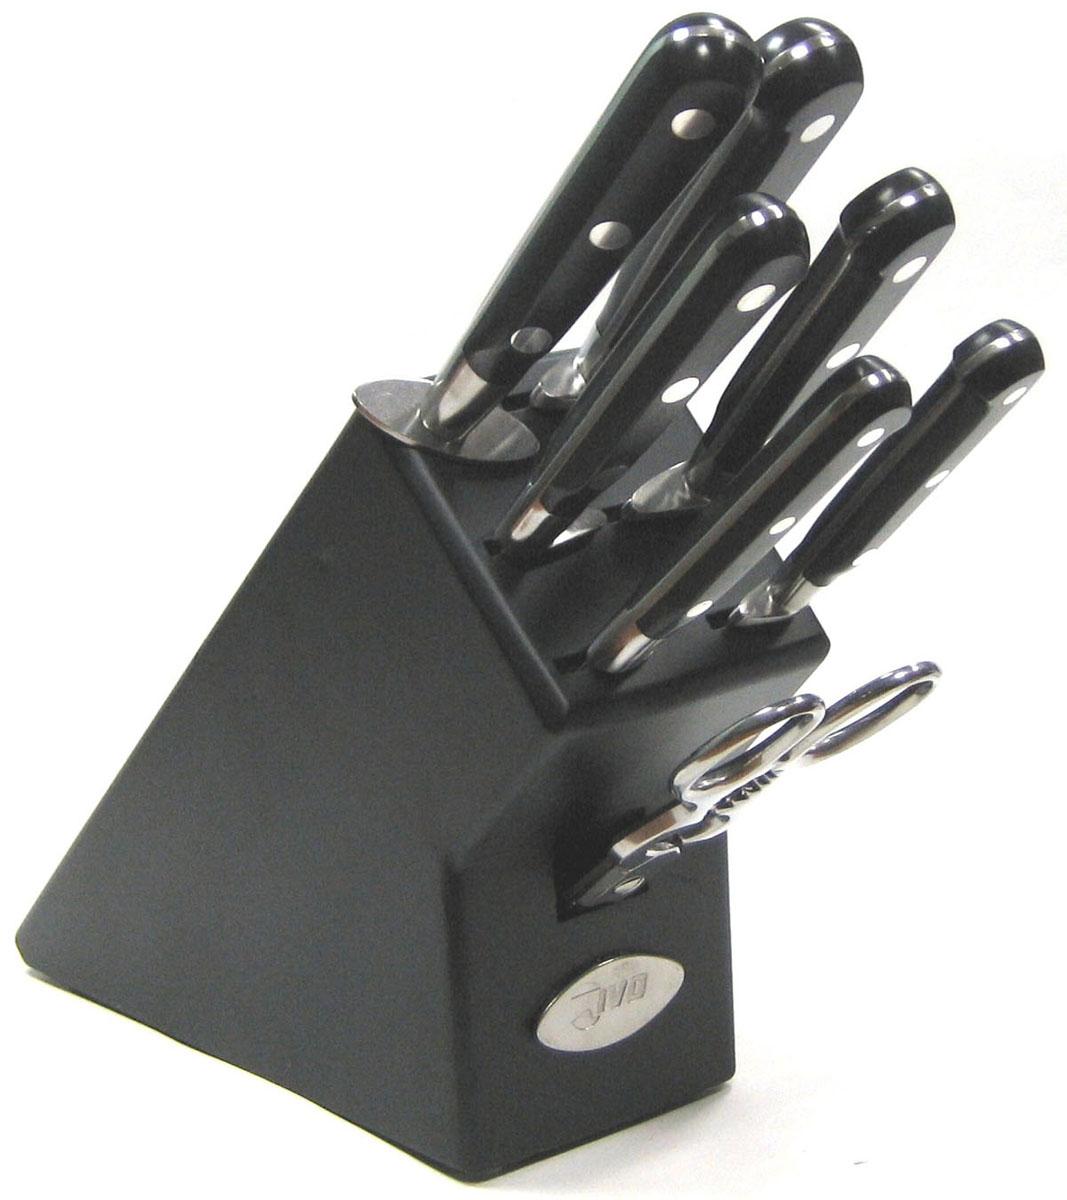 Набор ножей Ivo, на подставке, 8 предметов82078207 Набор ножей 8пр.